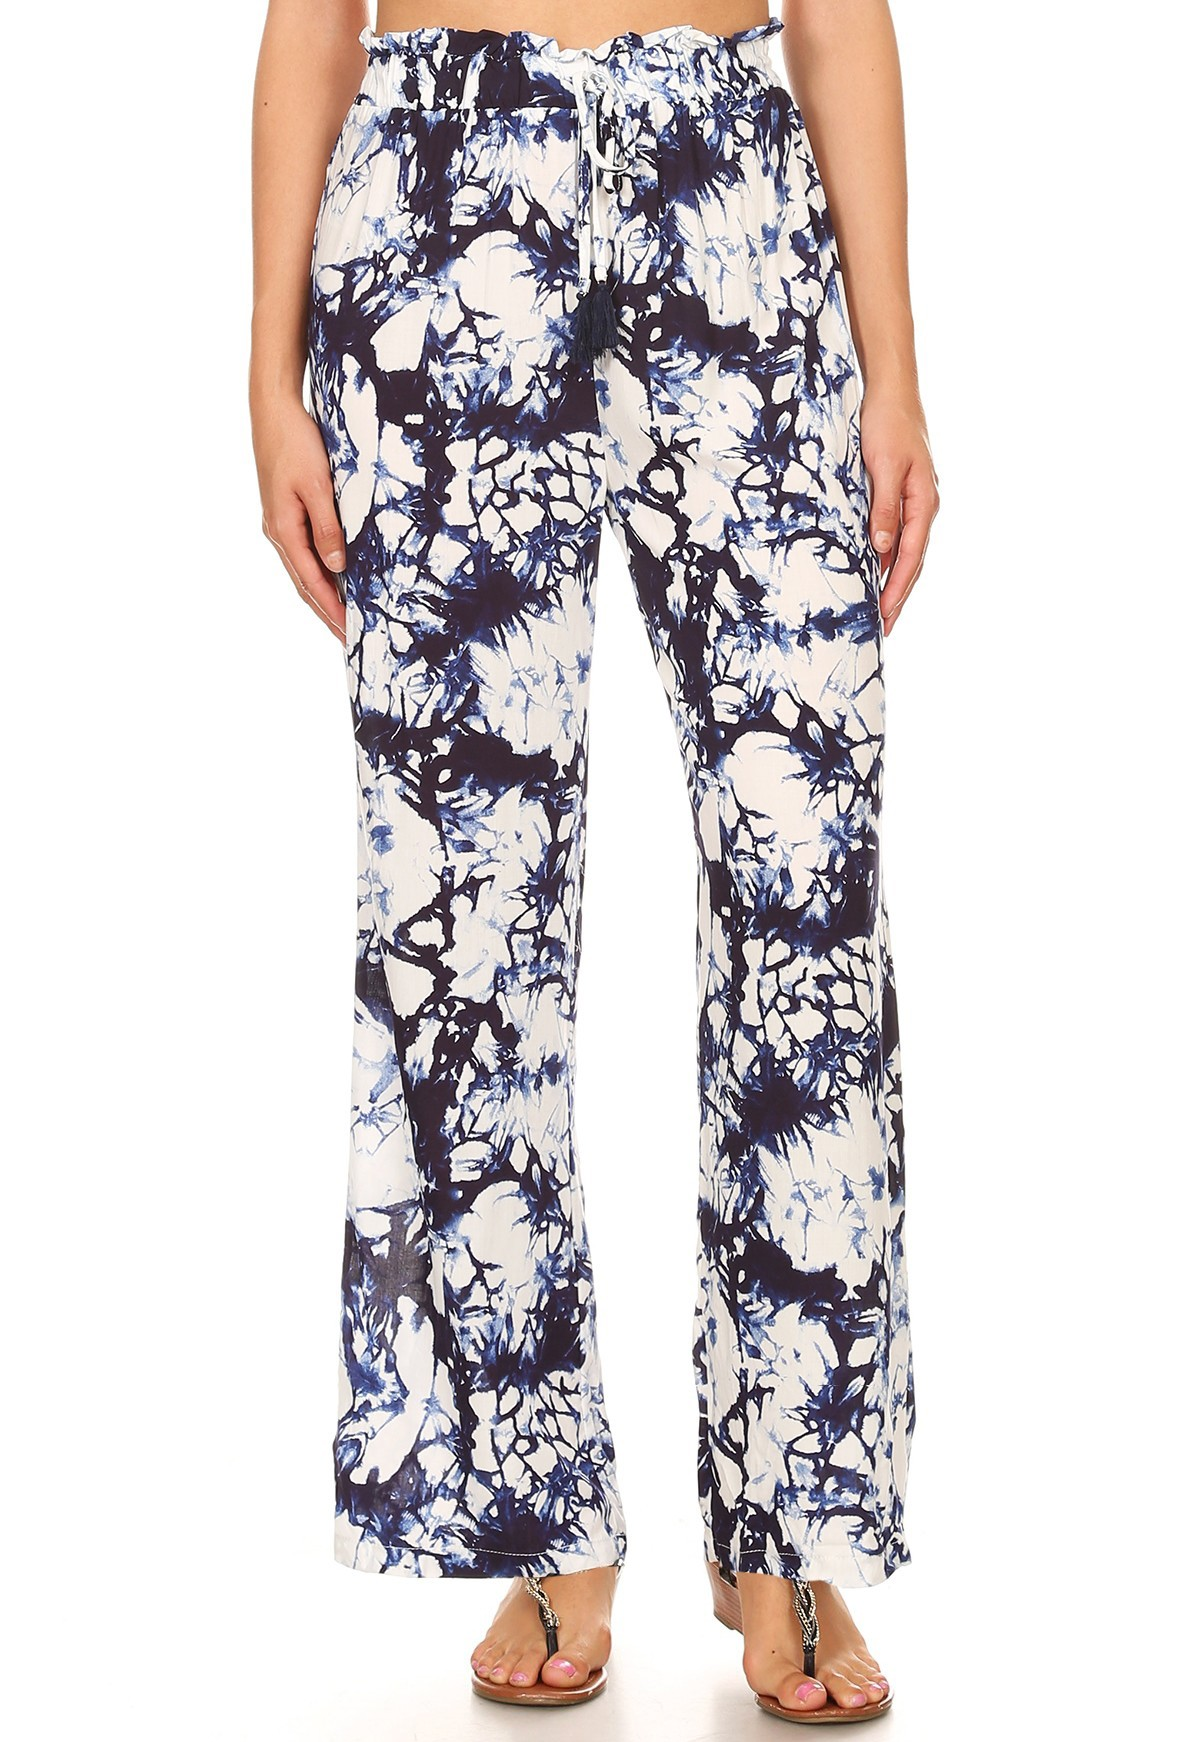 NAVY/WHITE TIE DYE PRINT PAPER BAG WAIST STRAIGHT LEG PANTS #8SLP05-08